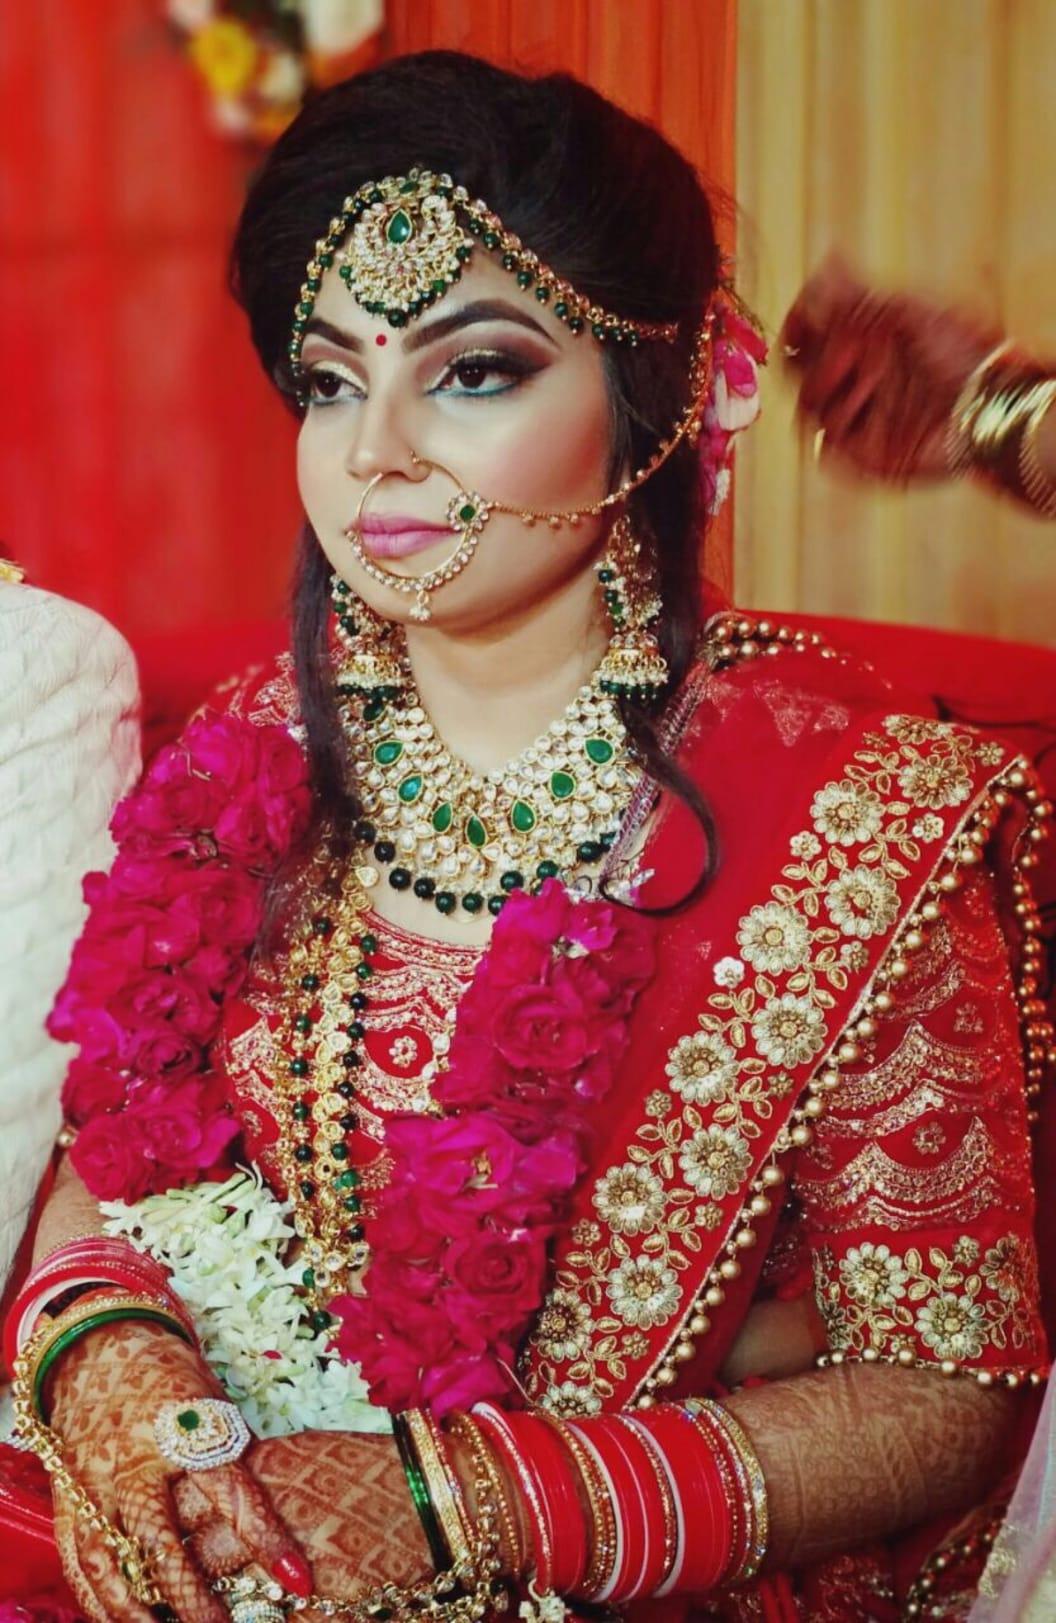 MakeUp by Ravleen Kaur in Delhi - UrbanClap - 웹